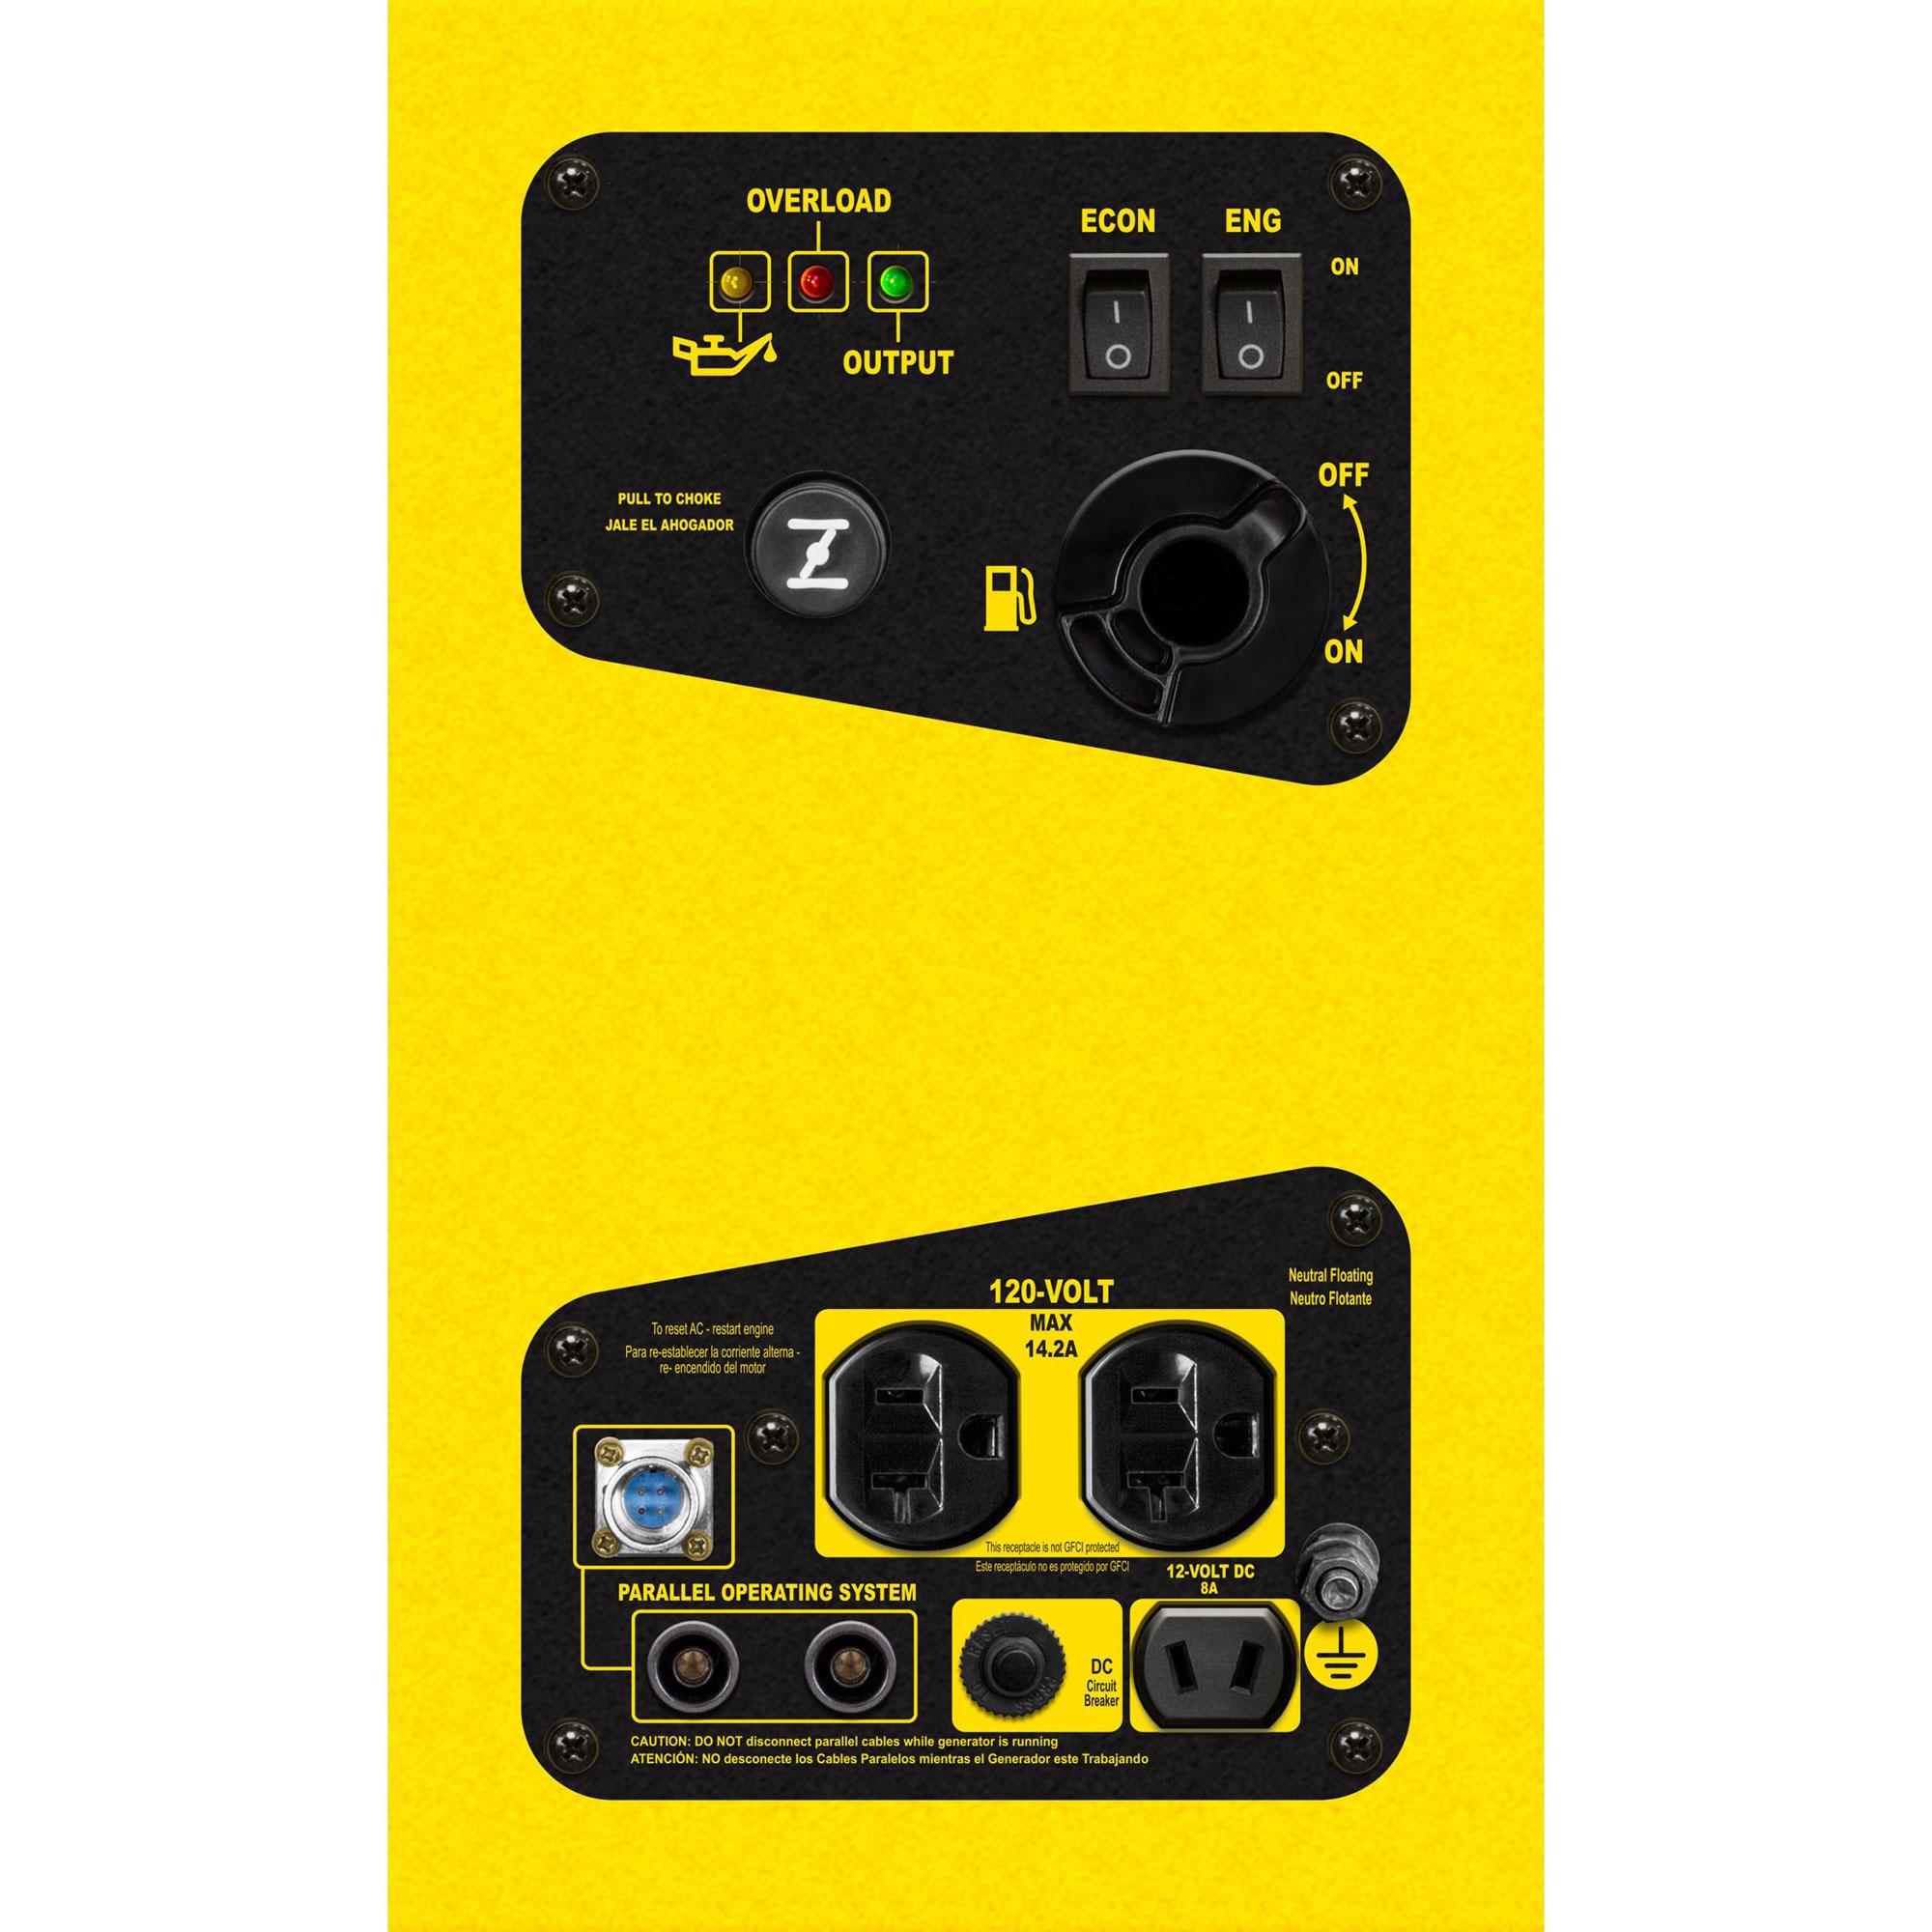 power it 2000 watt inverter generator manual